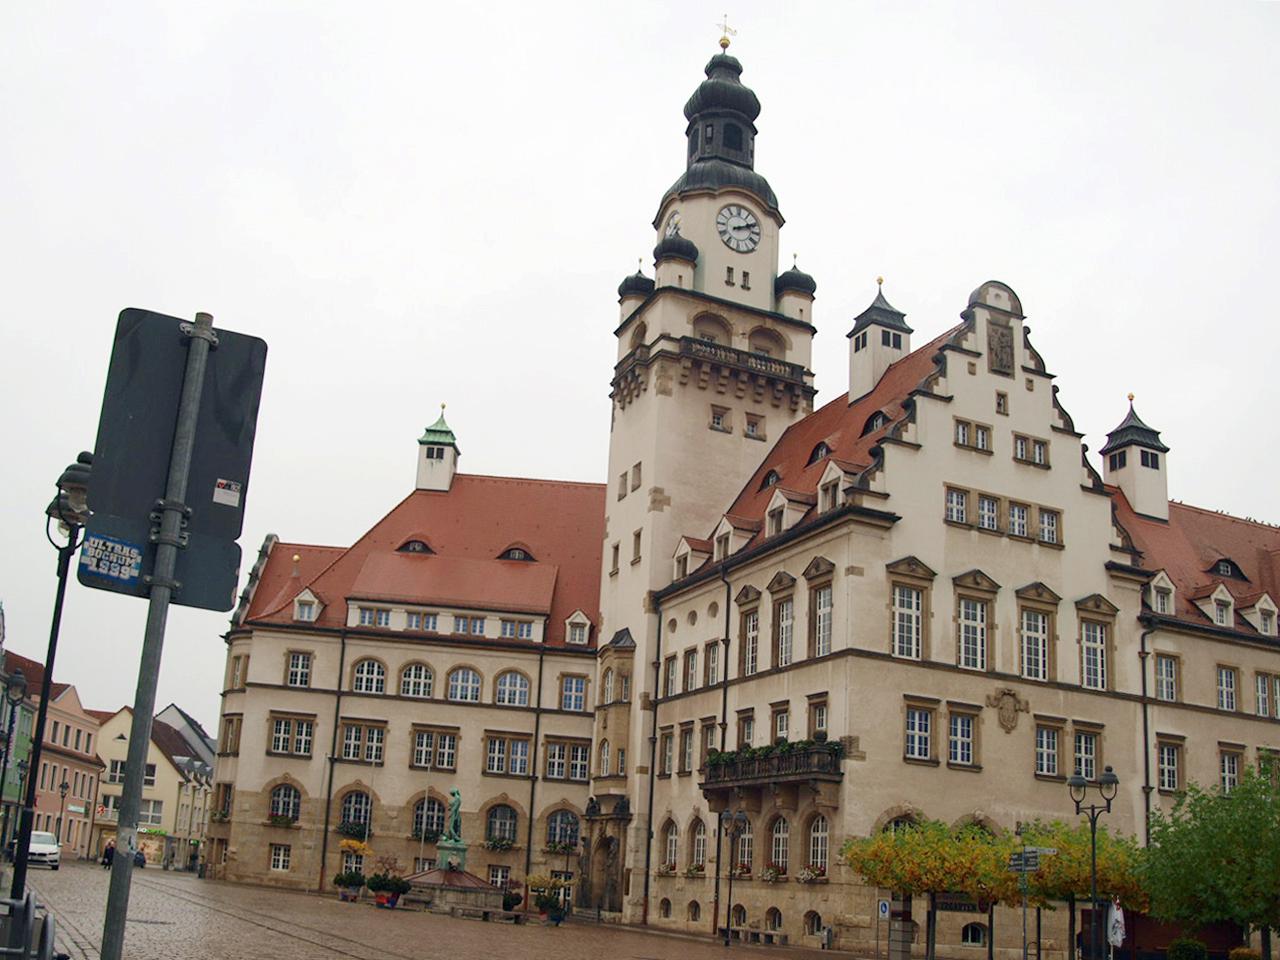 Döbeln Stadtrundgang Treibhaus